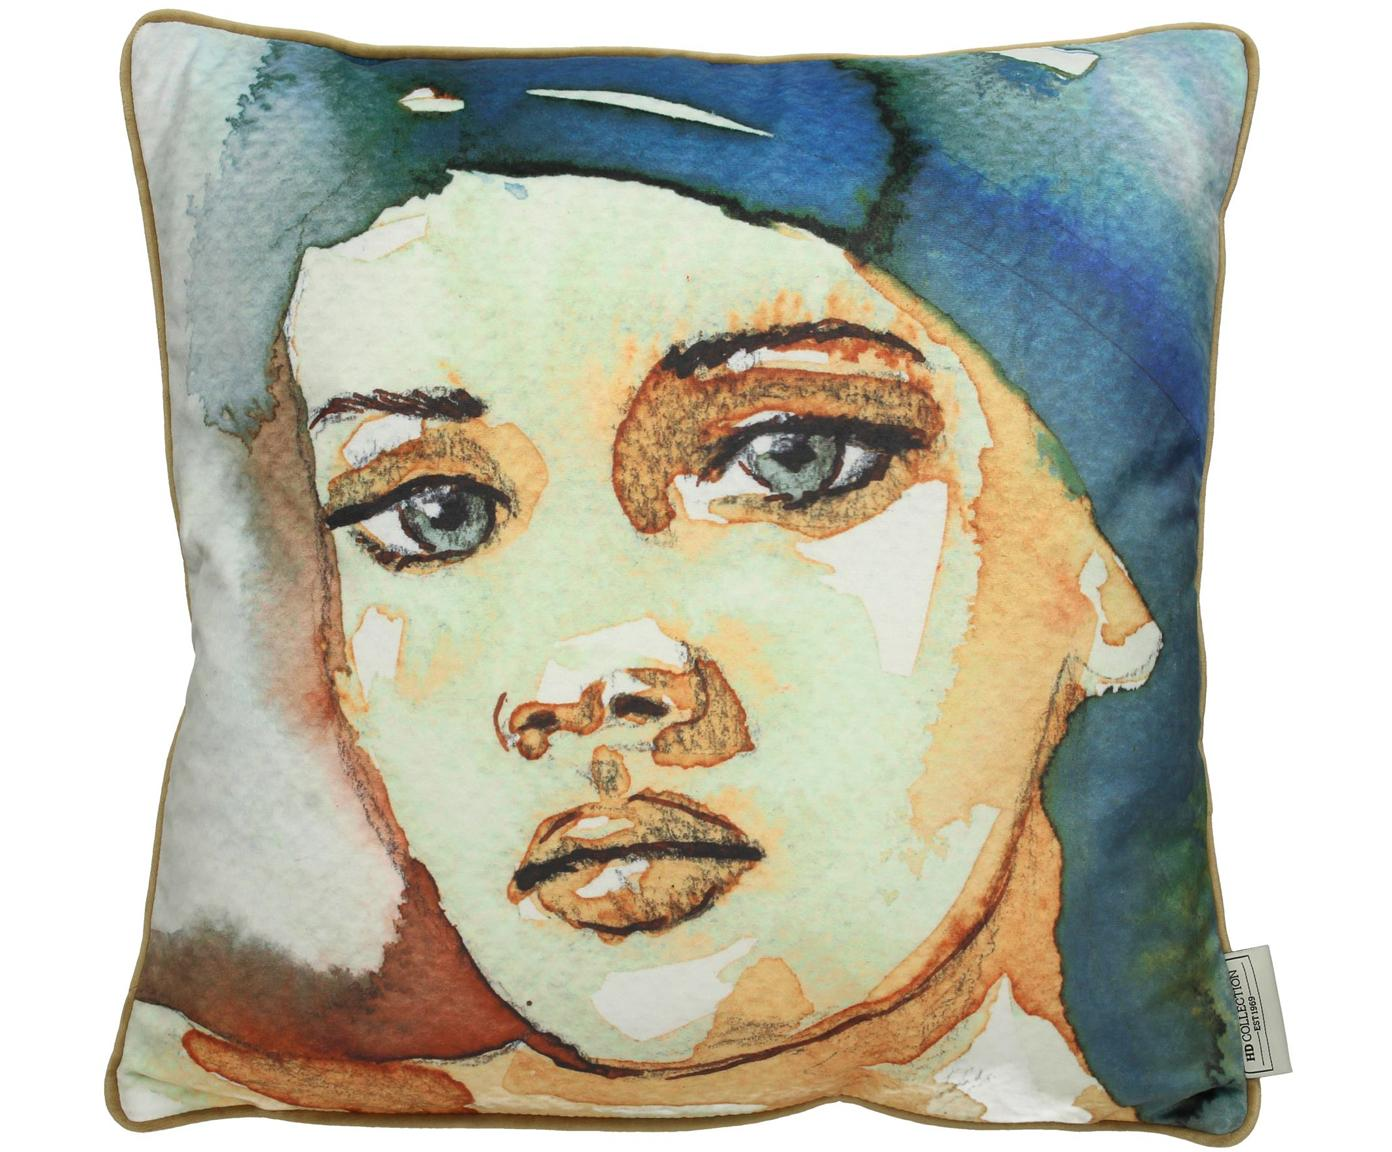 Samt-Kissen Girl mit Aquarell Print, mit Inlett, 100% Samt, Blau,Beige, 45 x 45 cm